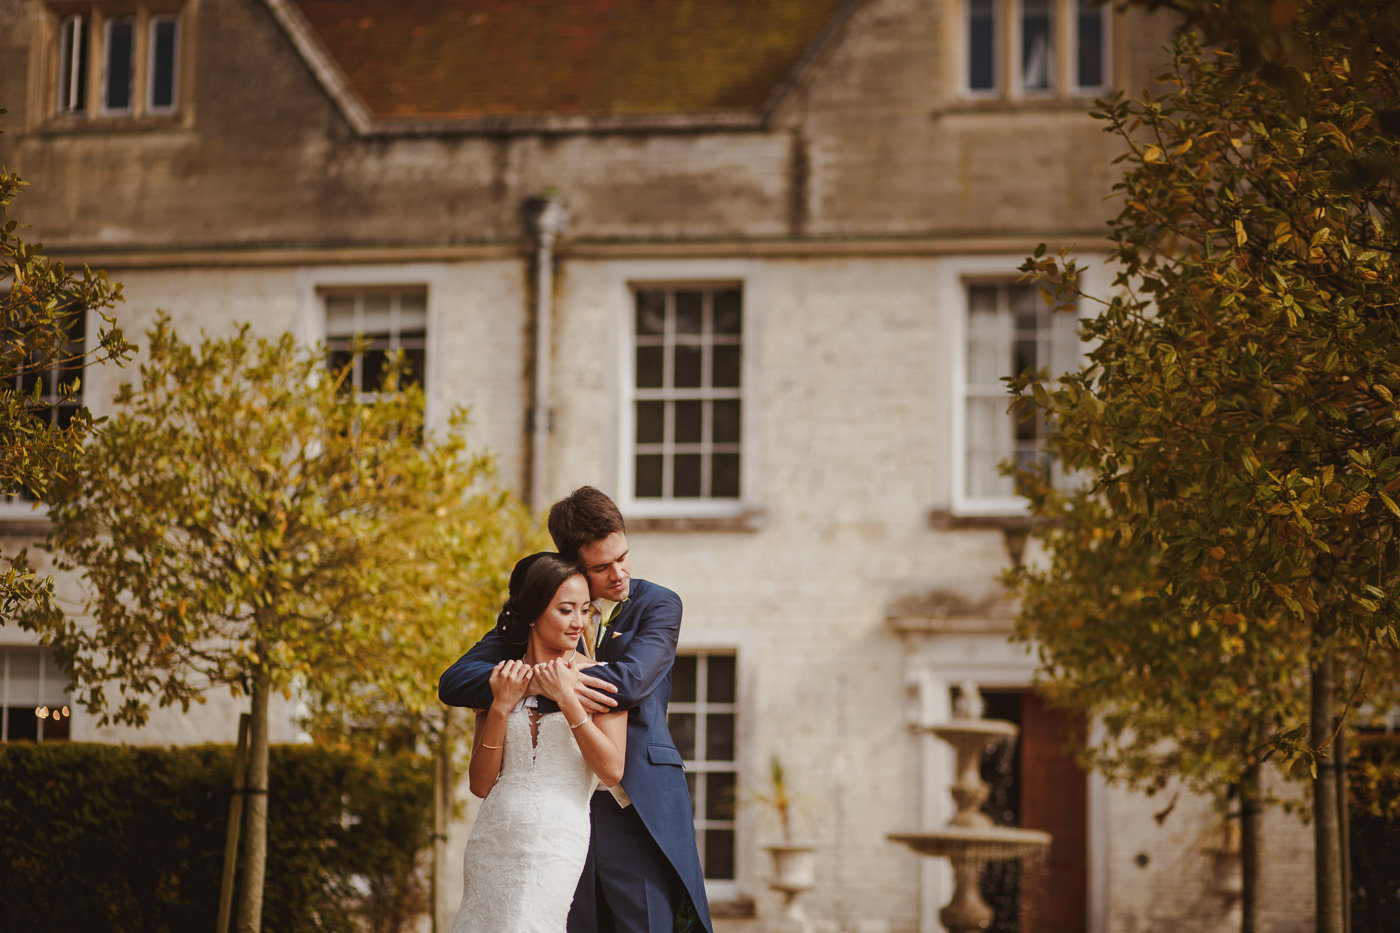 froyle-park-wedding-photography-29.jpg